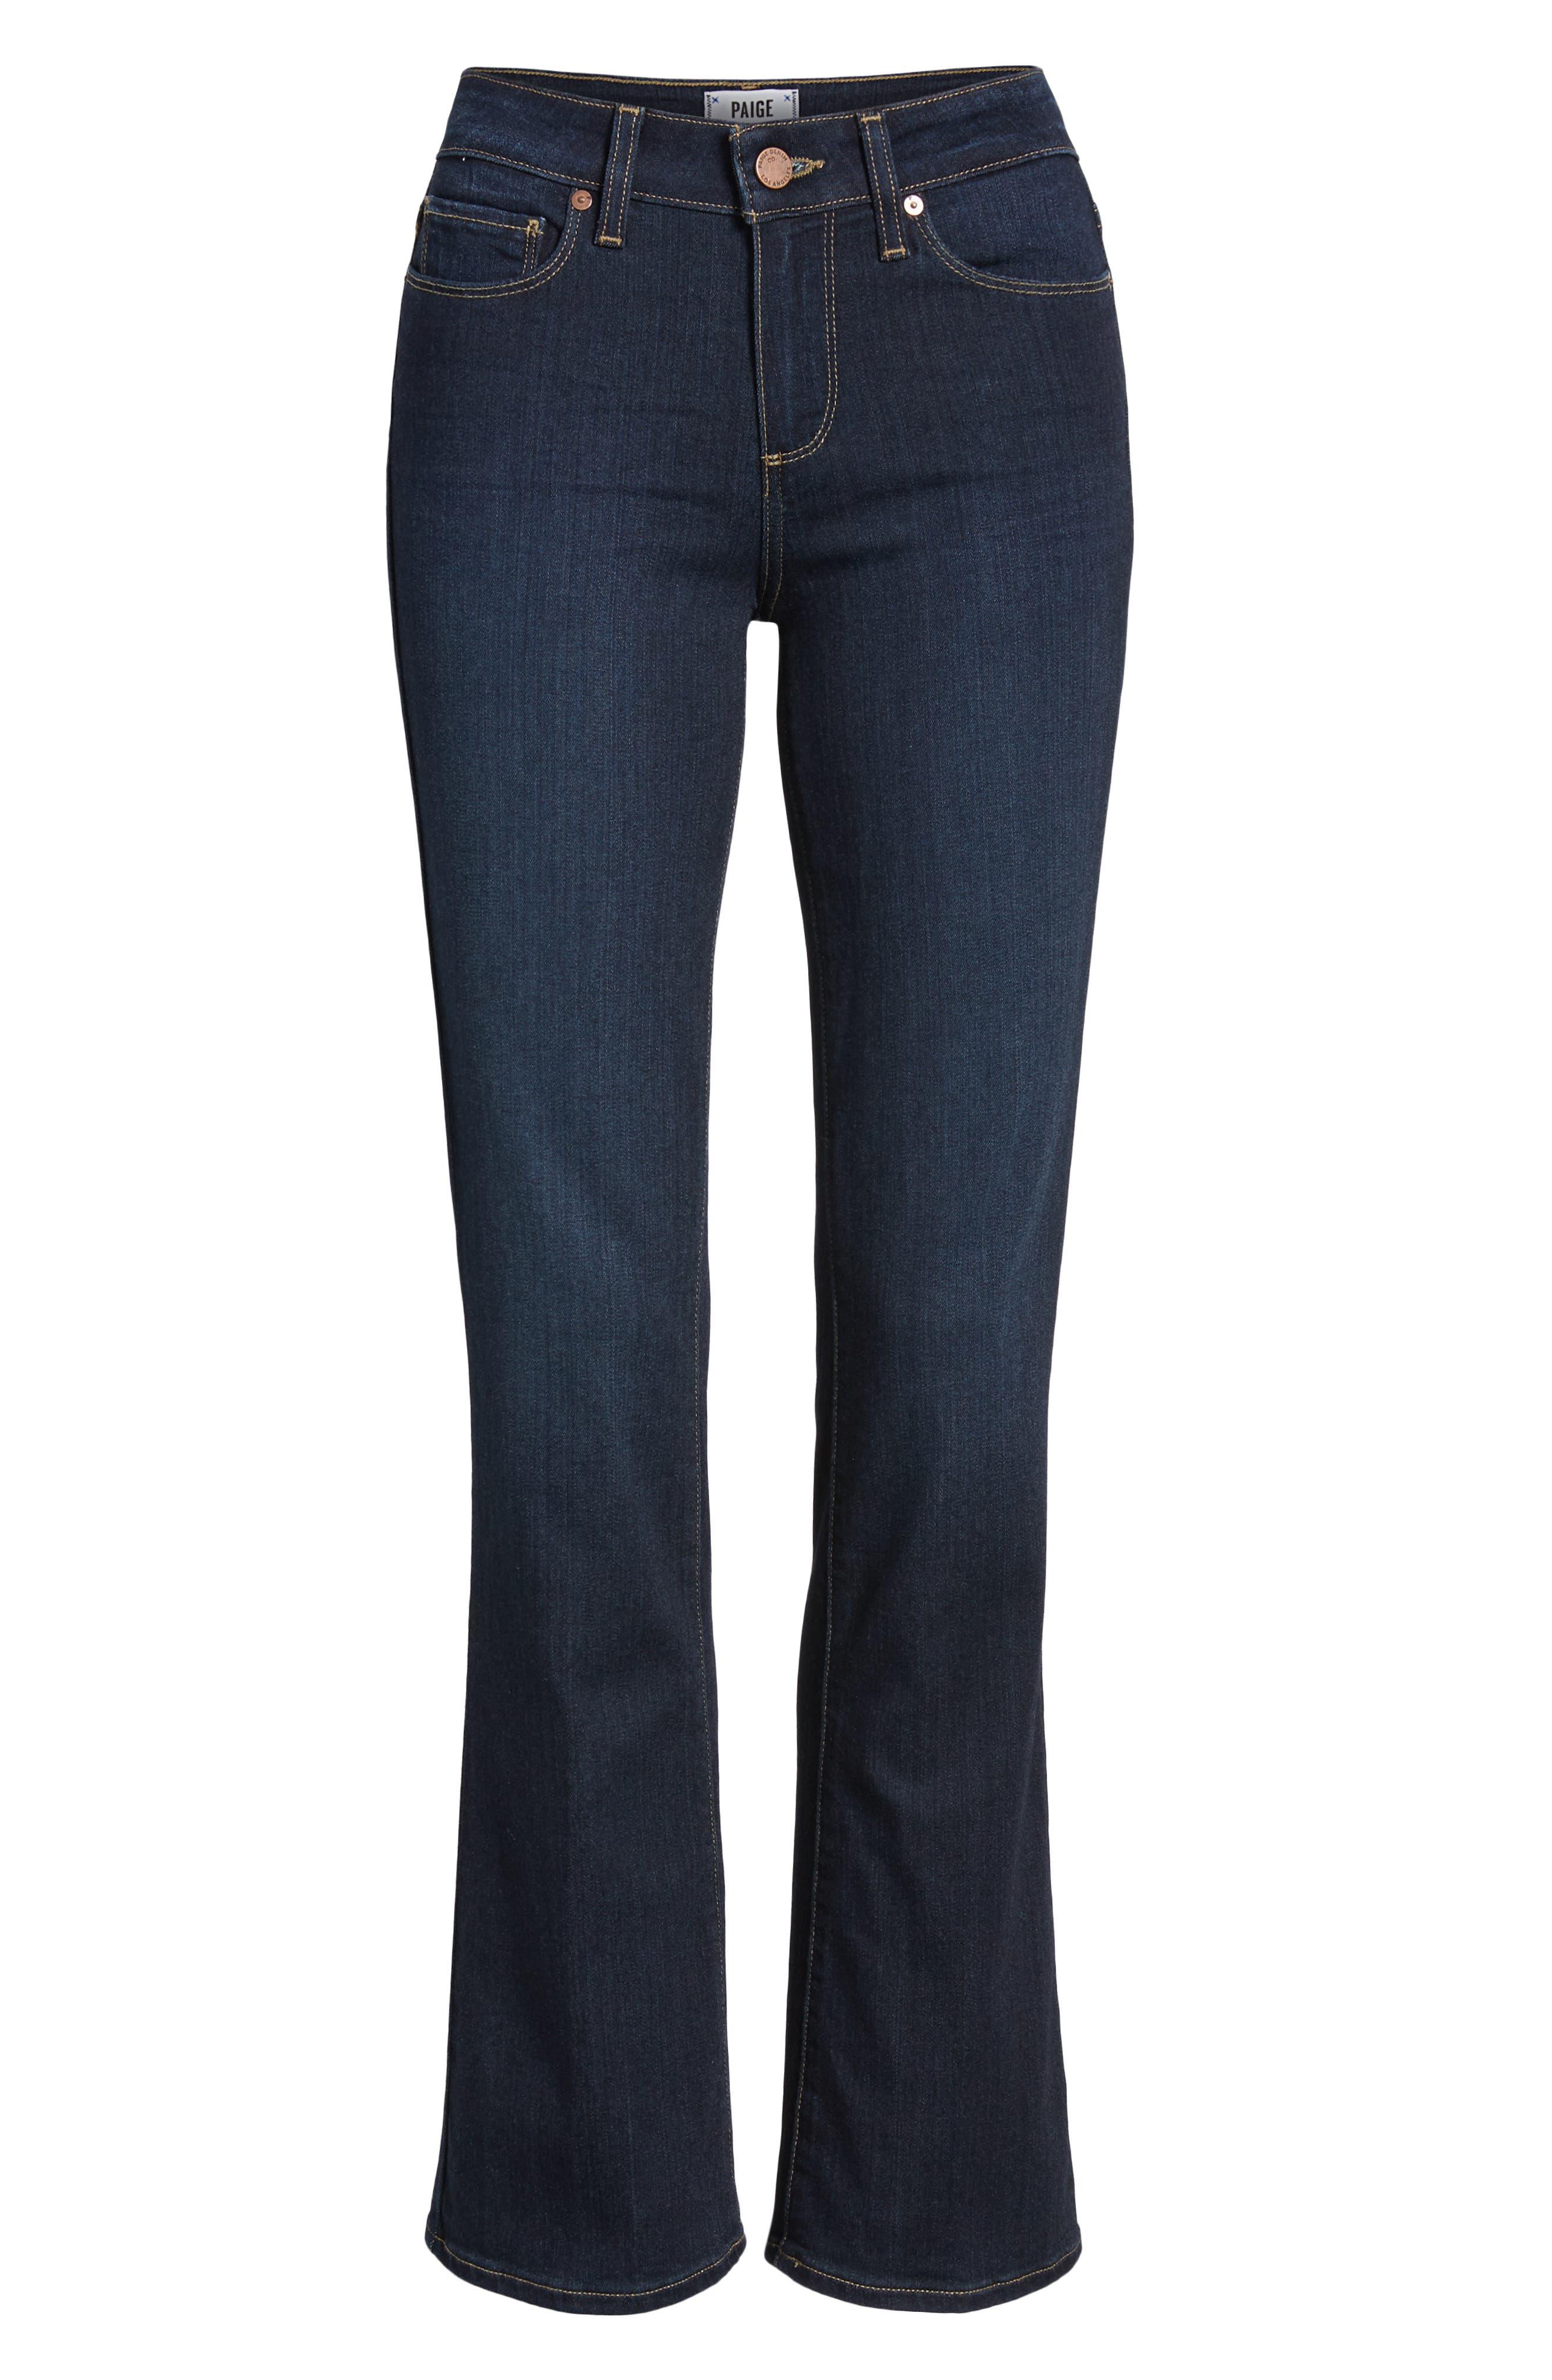 Transcend - Manhattan High Waist Bootcut Jeans,                             Alternate thumbnail 7, color,                             SANIA